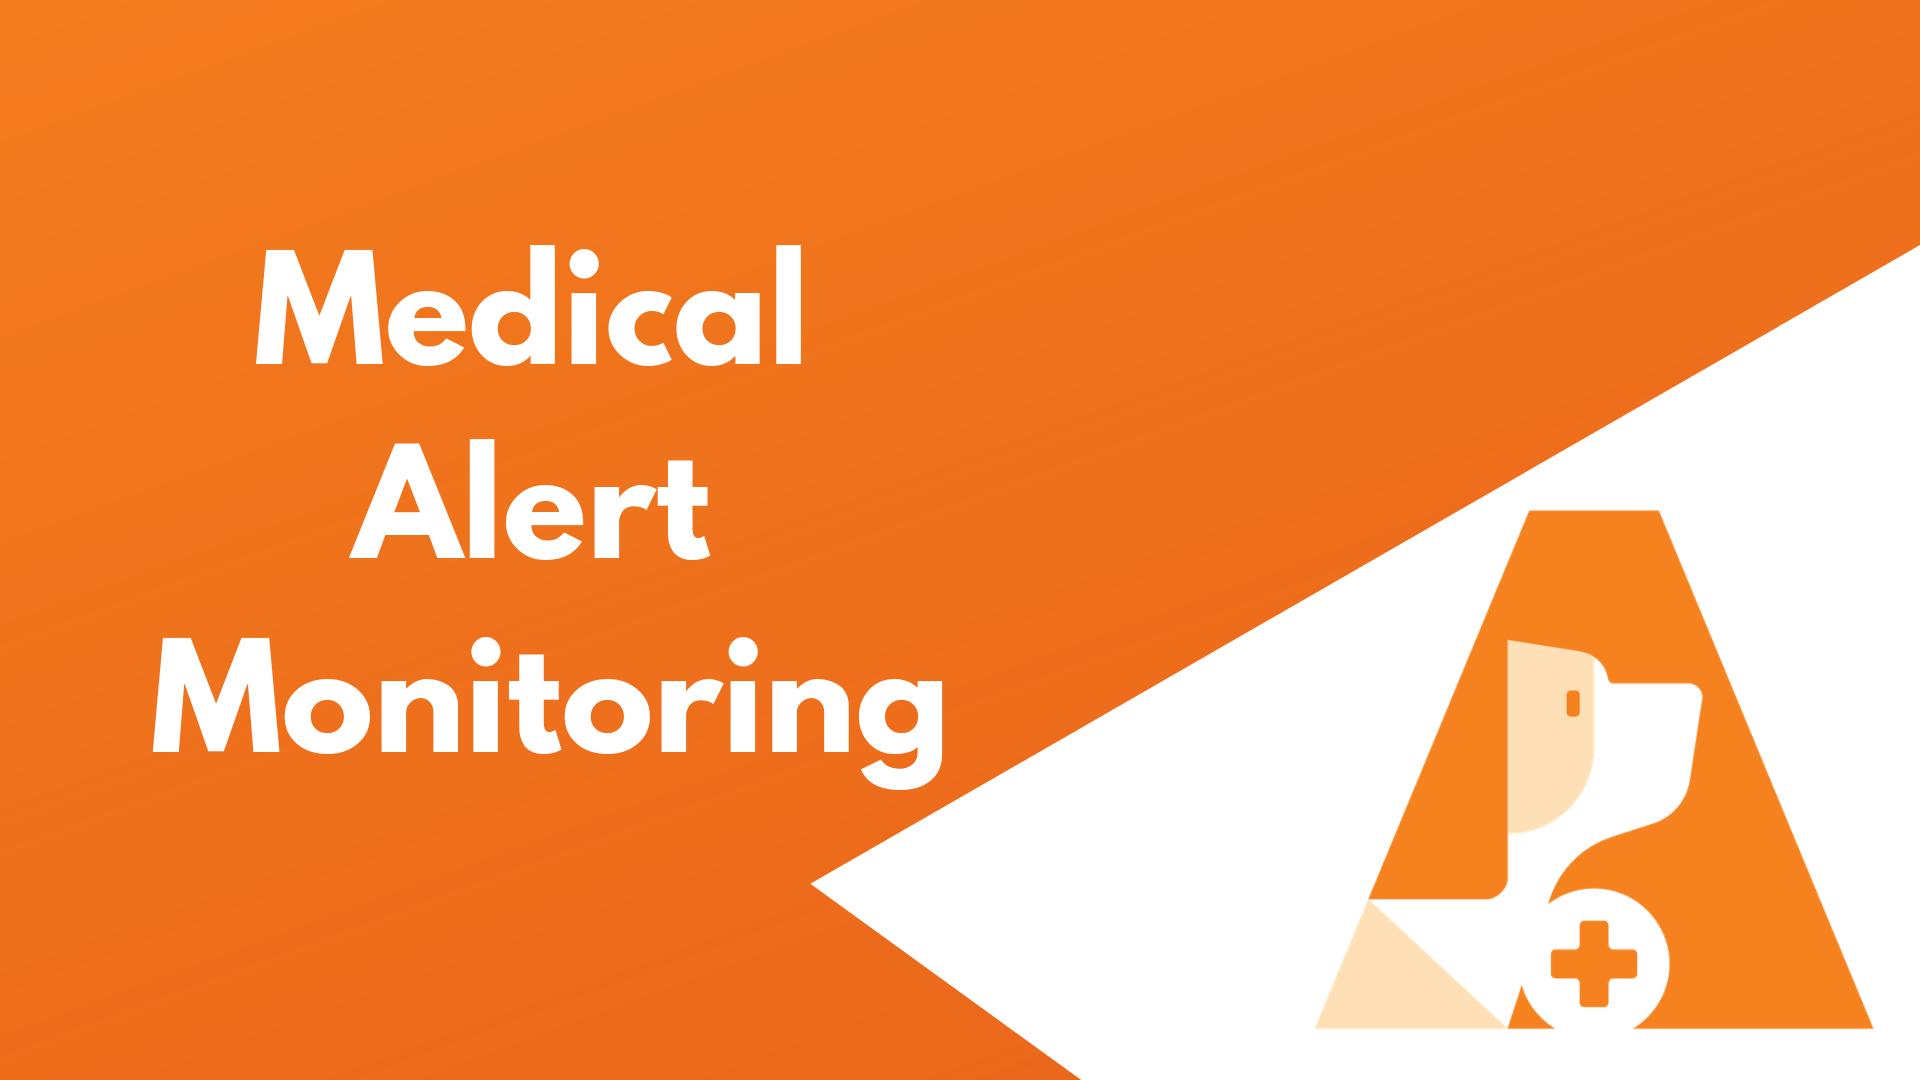 Medical Alert Pricing (1)